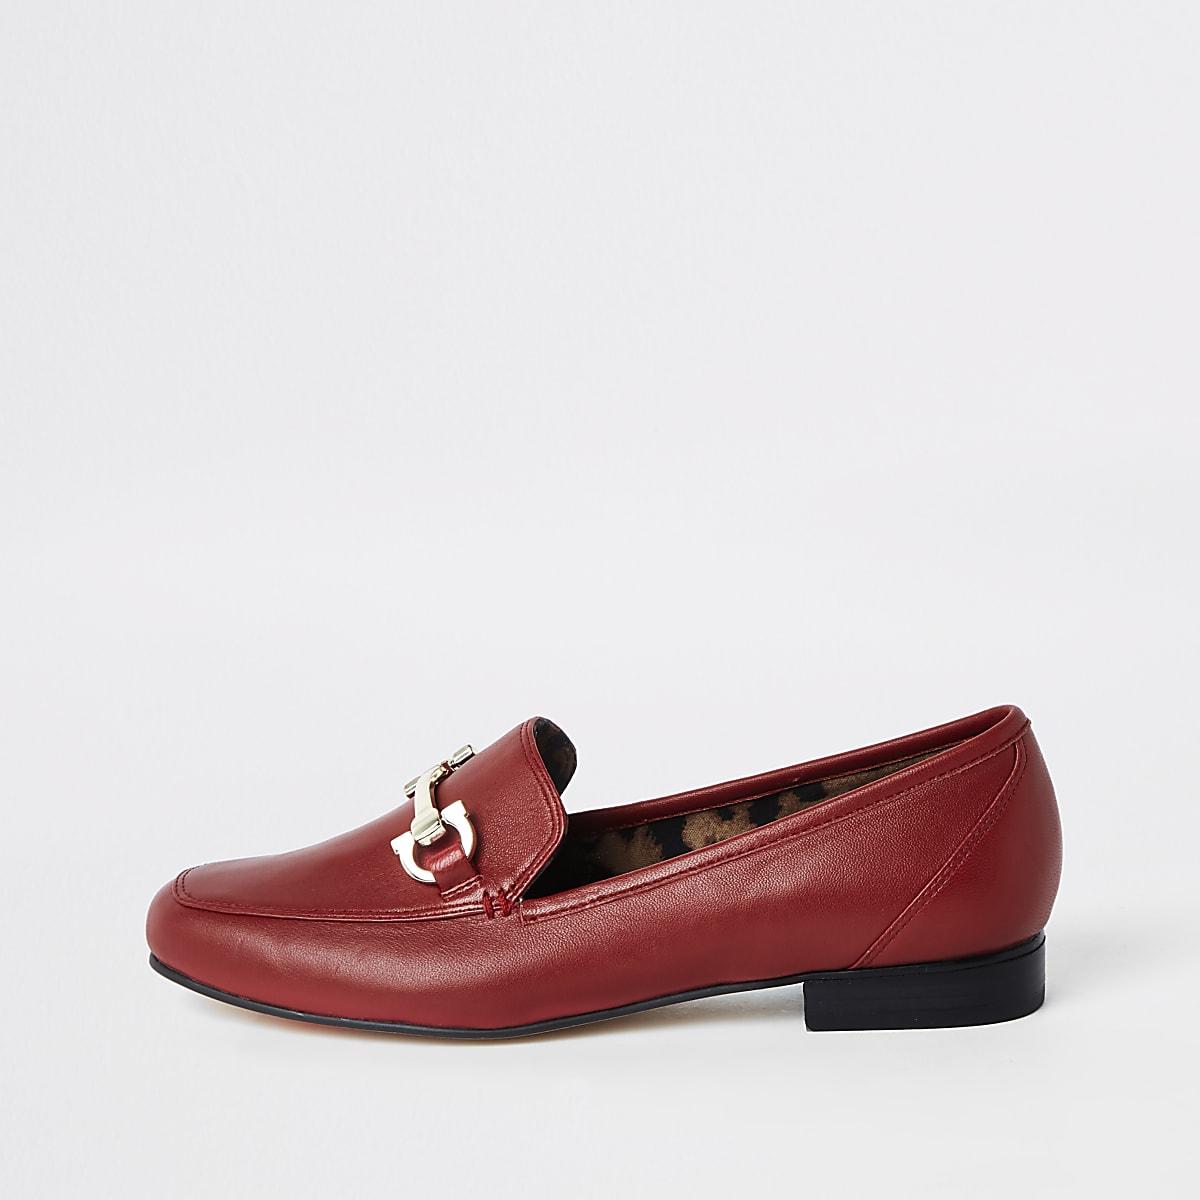 Rode leren loafers